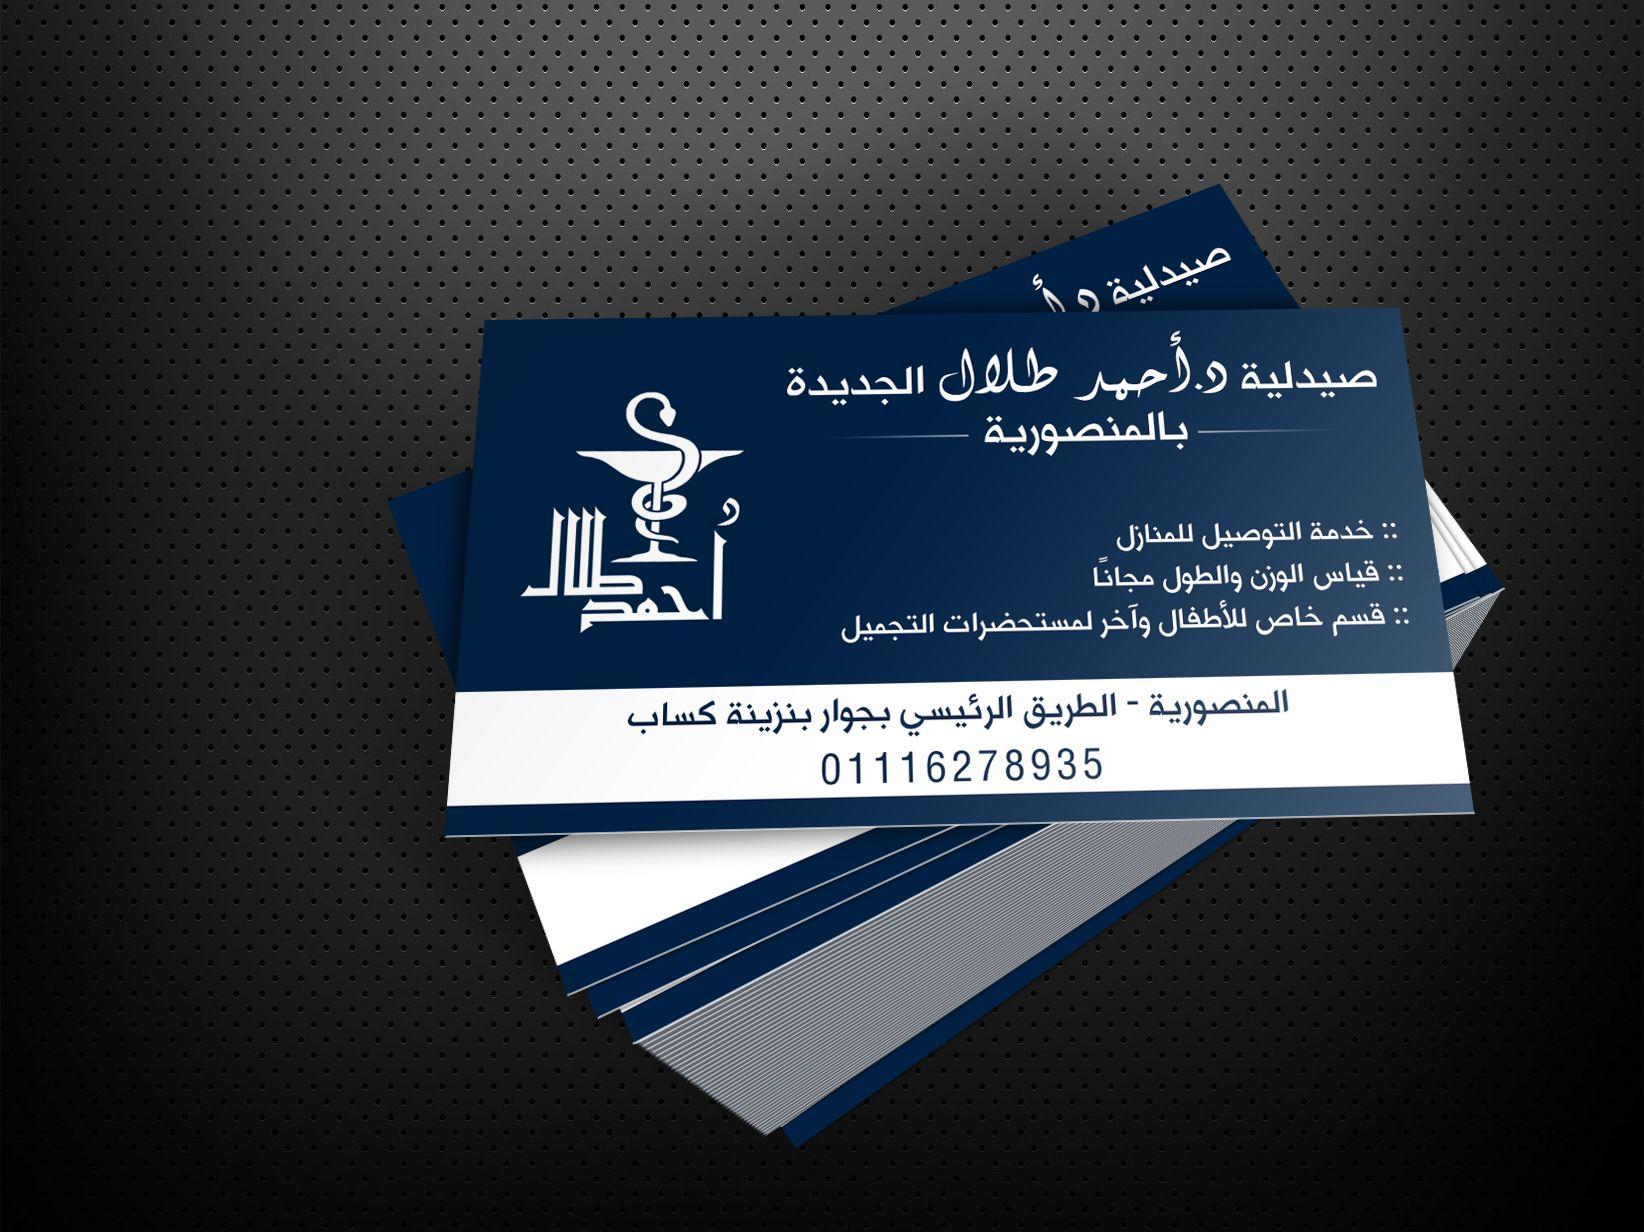 كرت صيدلية د أحمد طلال Business Cards Business Cards